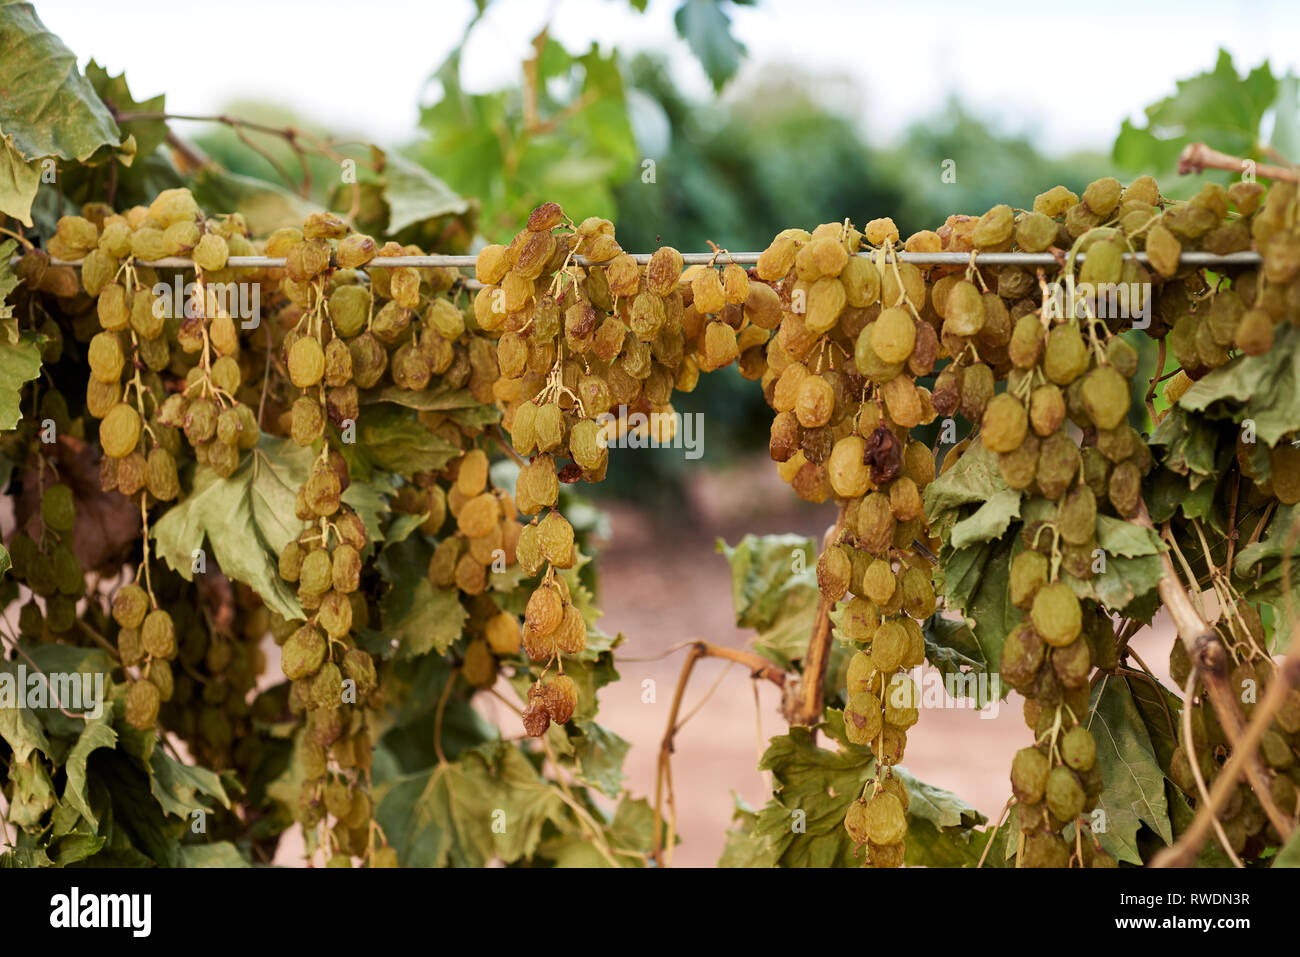 Sun Muscat grapes, drying on the vine, Mildura region. - Stock Image